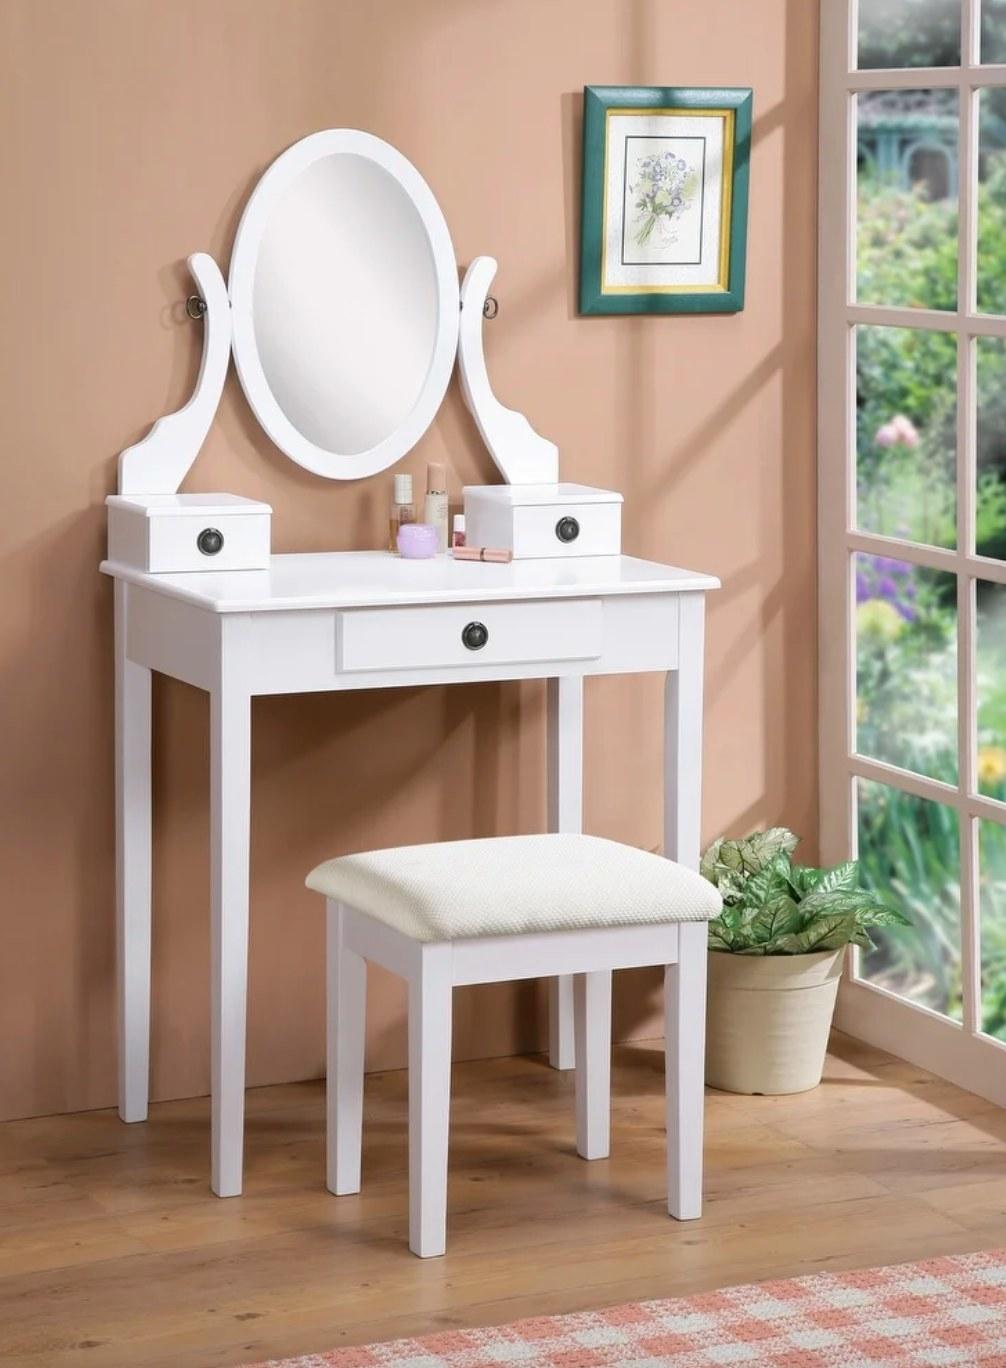 The vanity set in white